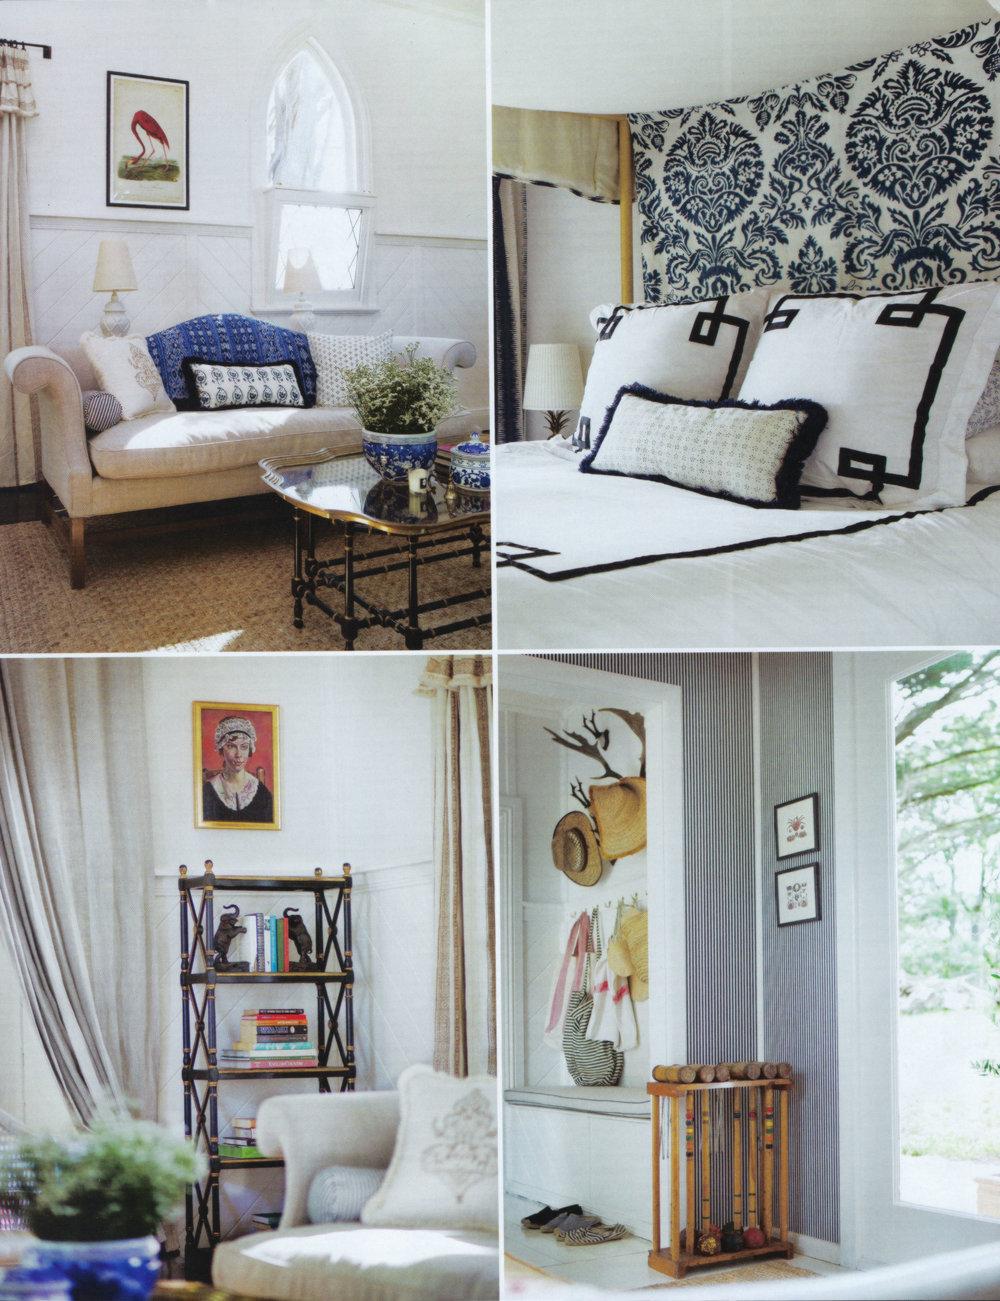 Portfolio interior design diane bergeron interiors - House And Garden June 2017 P112 Jpg